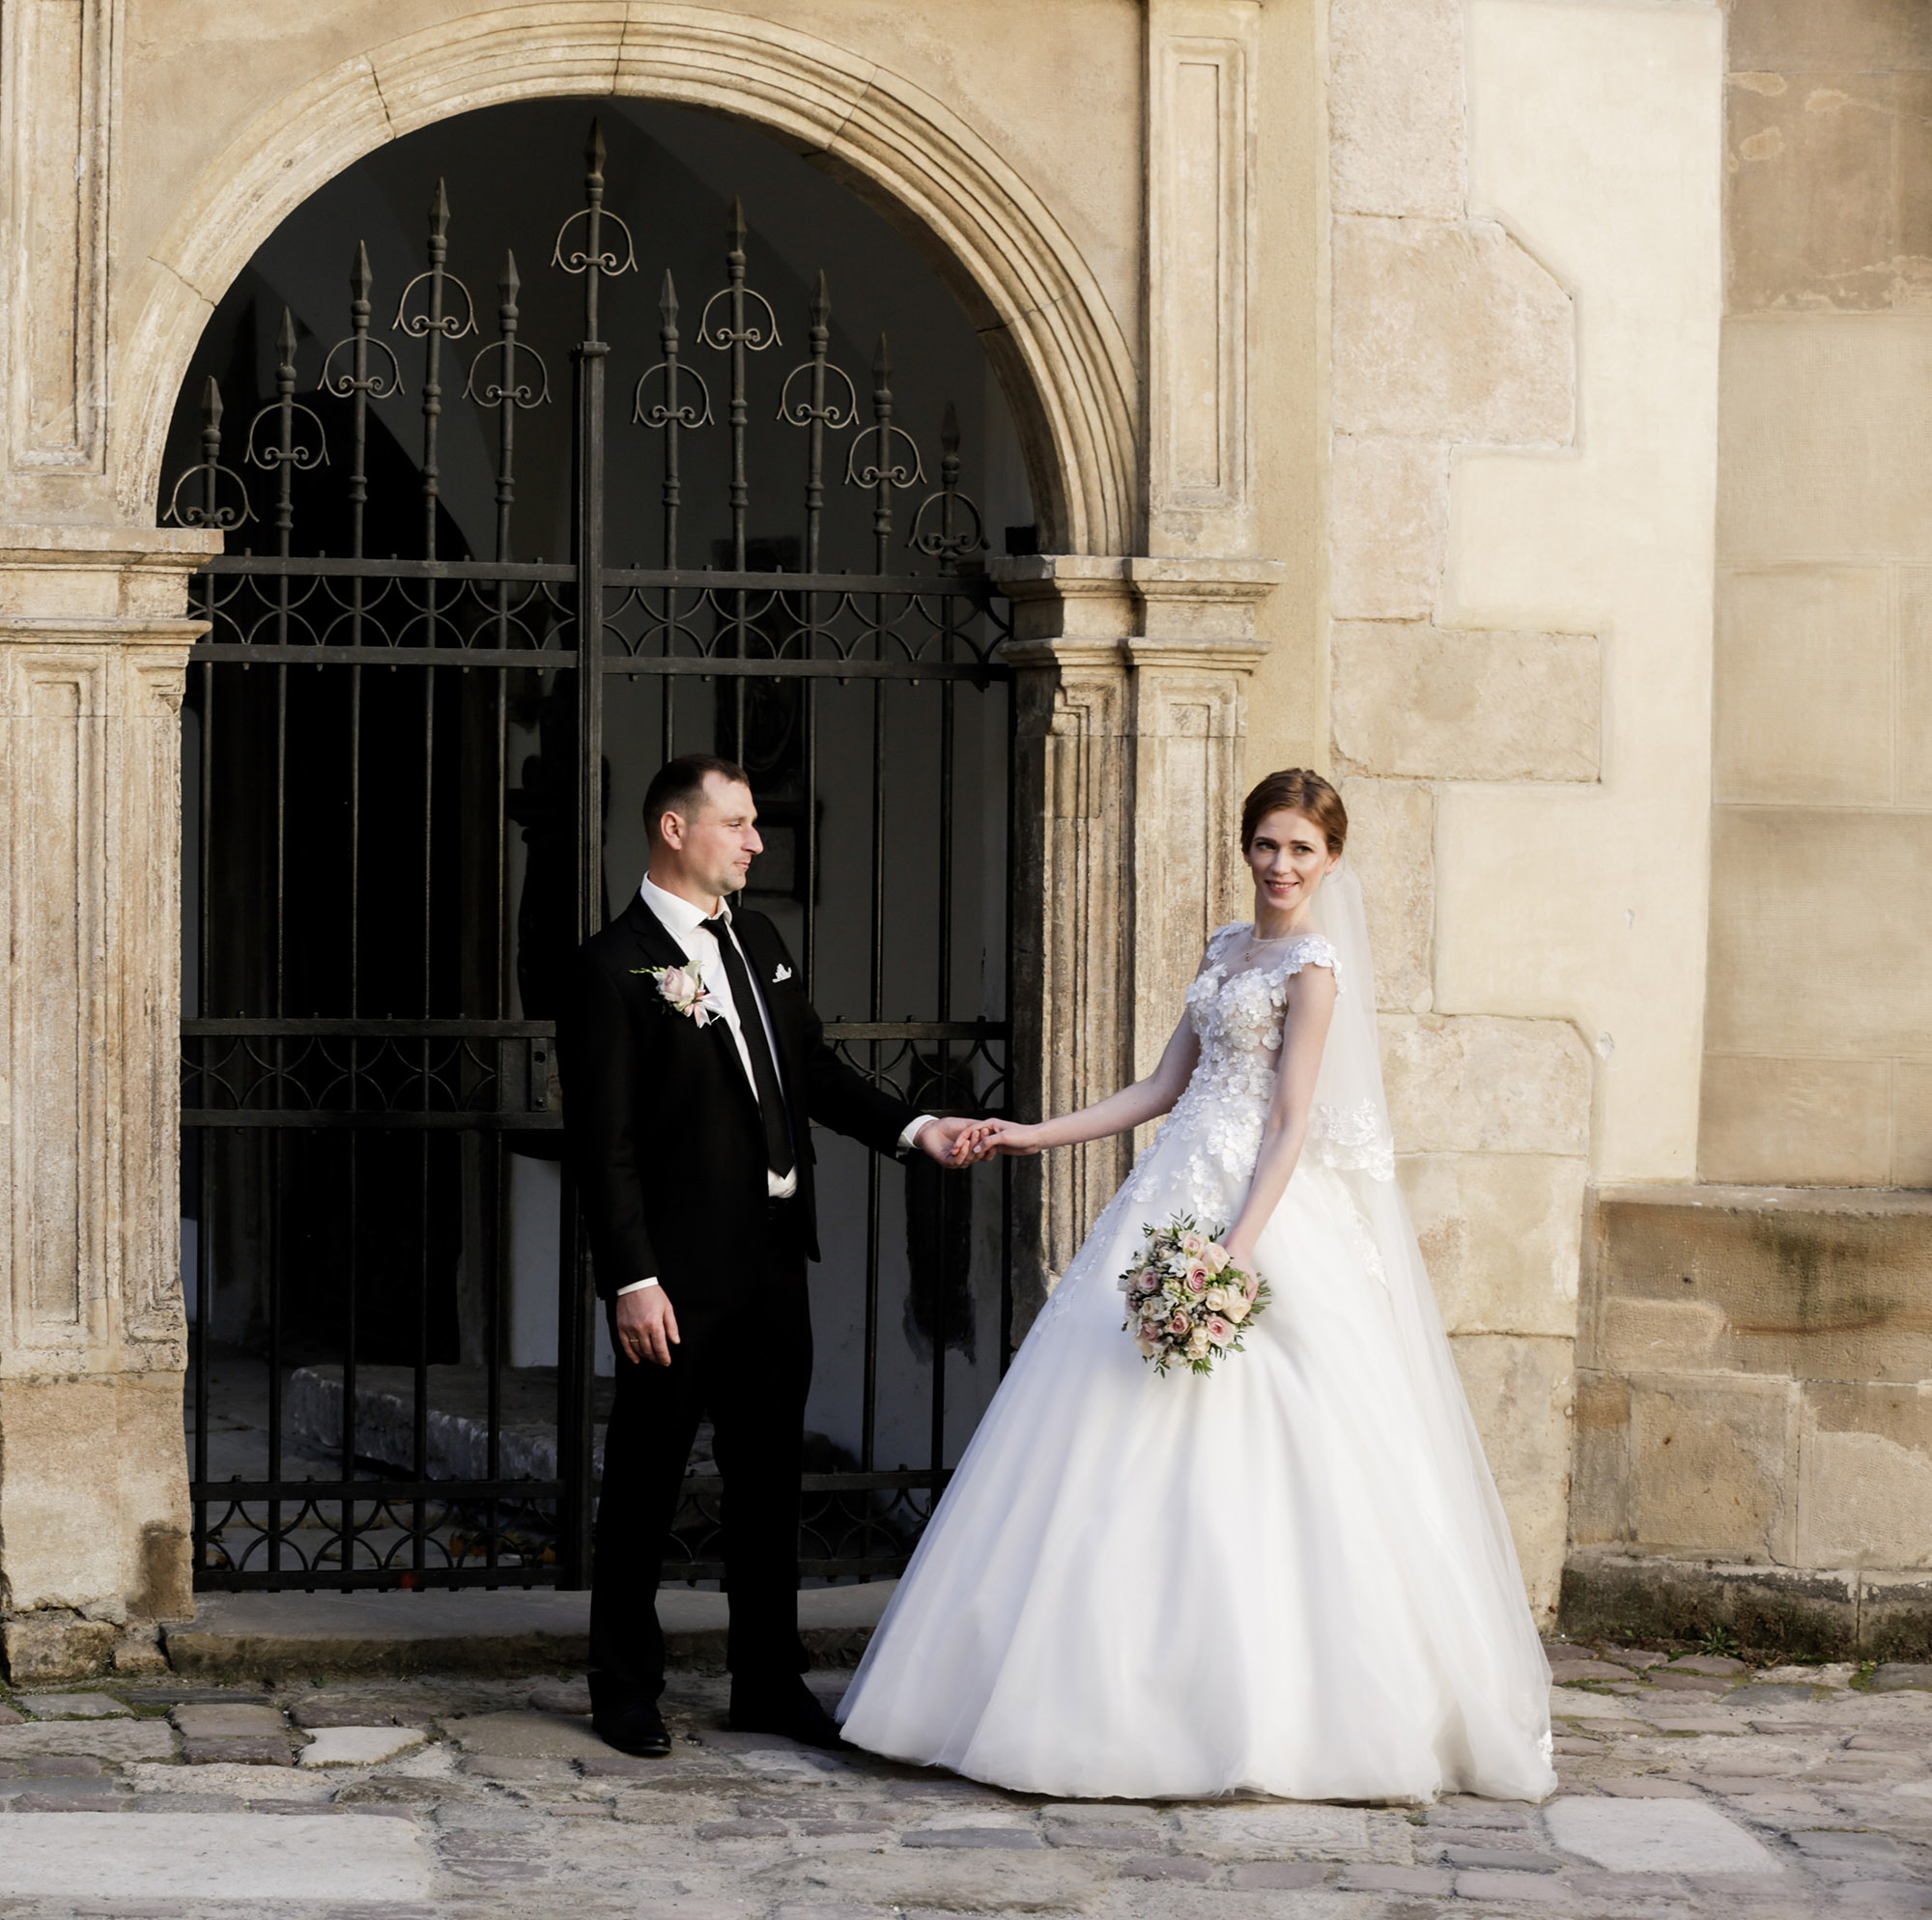 Masha Photographe  : When shooting weddings, Masha focuses on candid moments using artistic style to create that perfect shot.